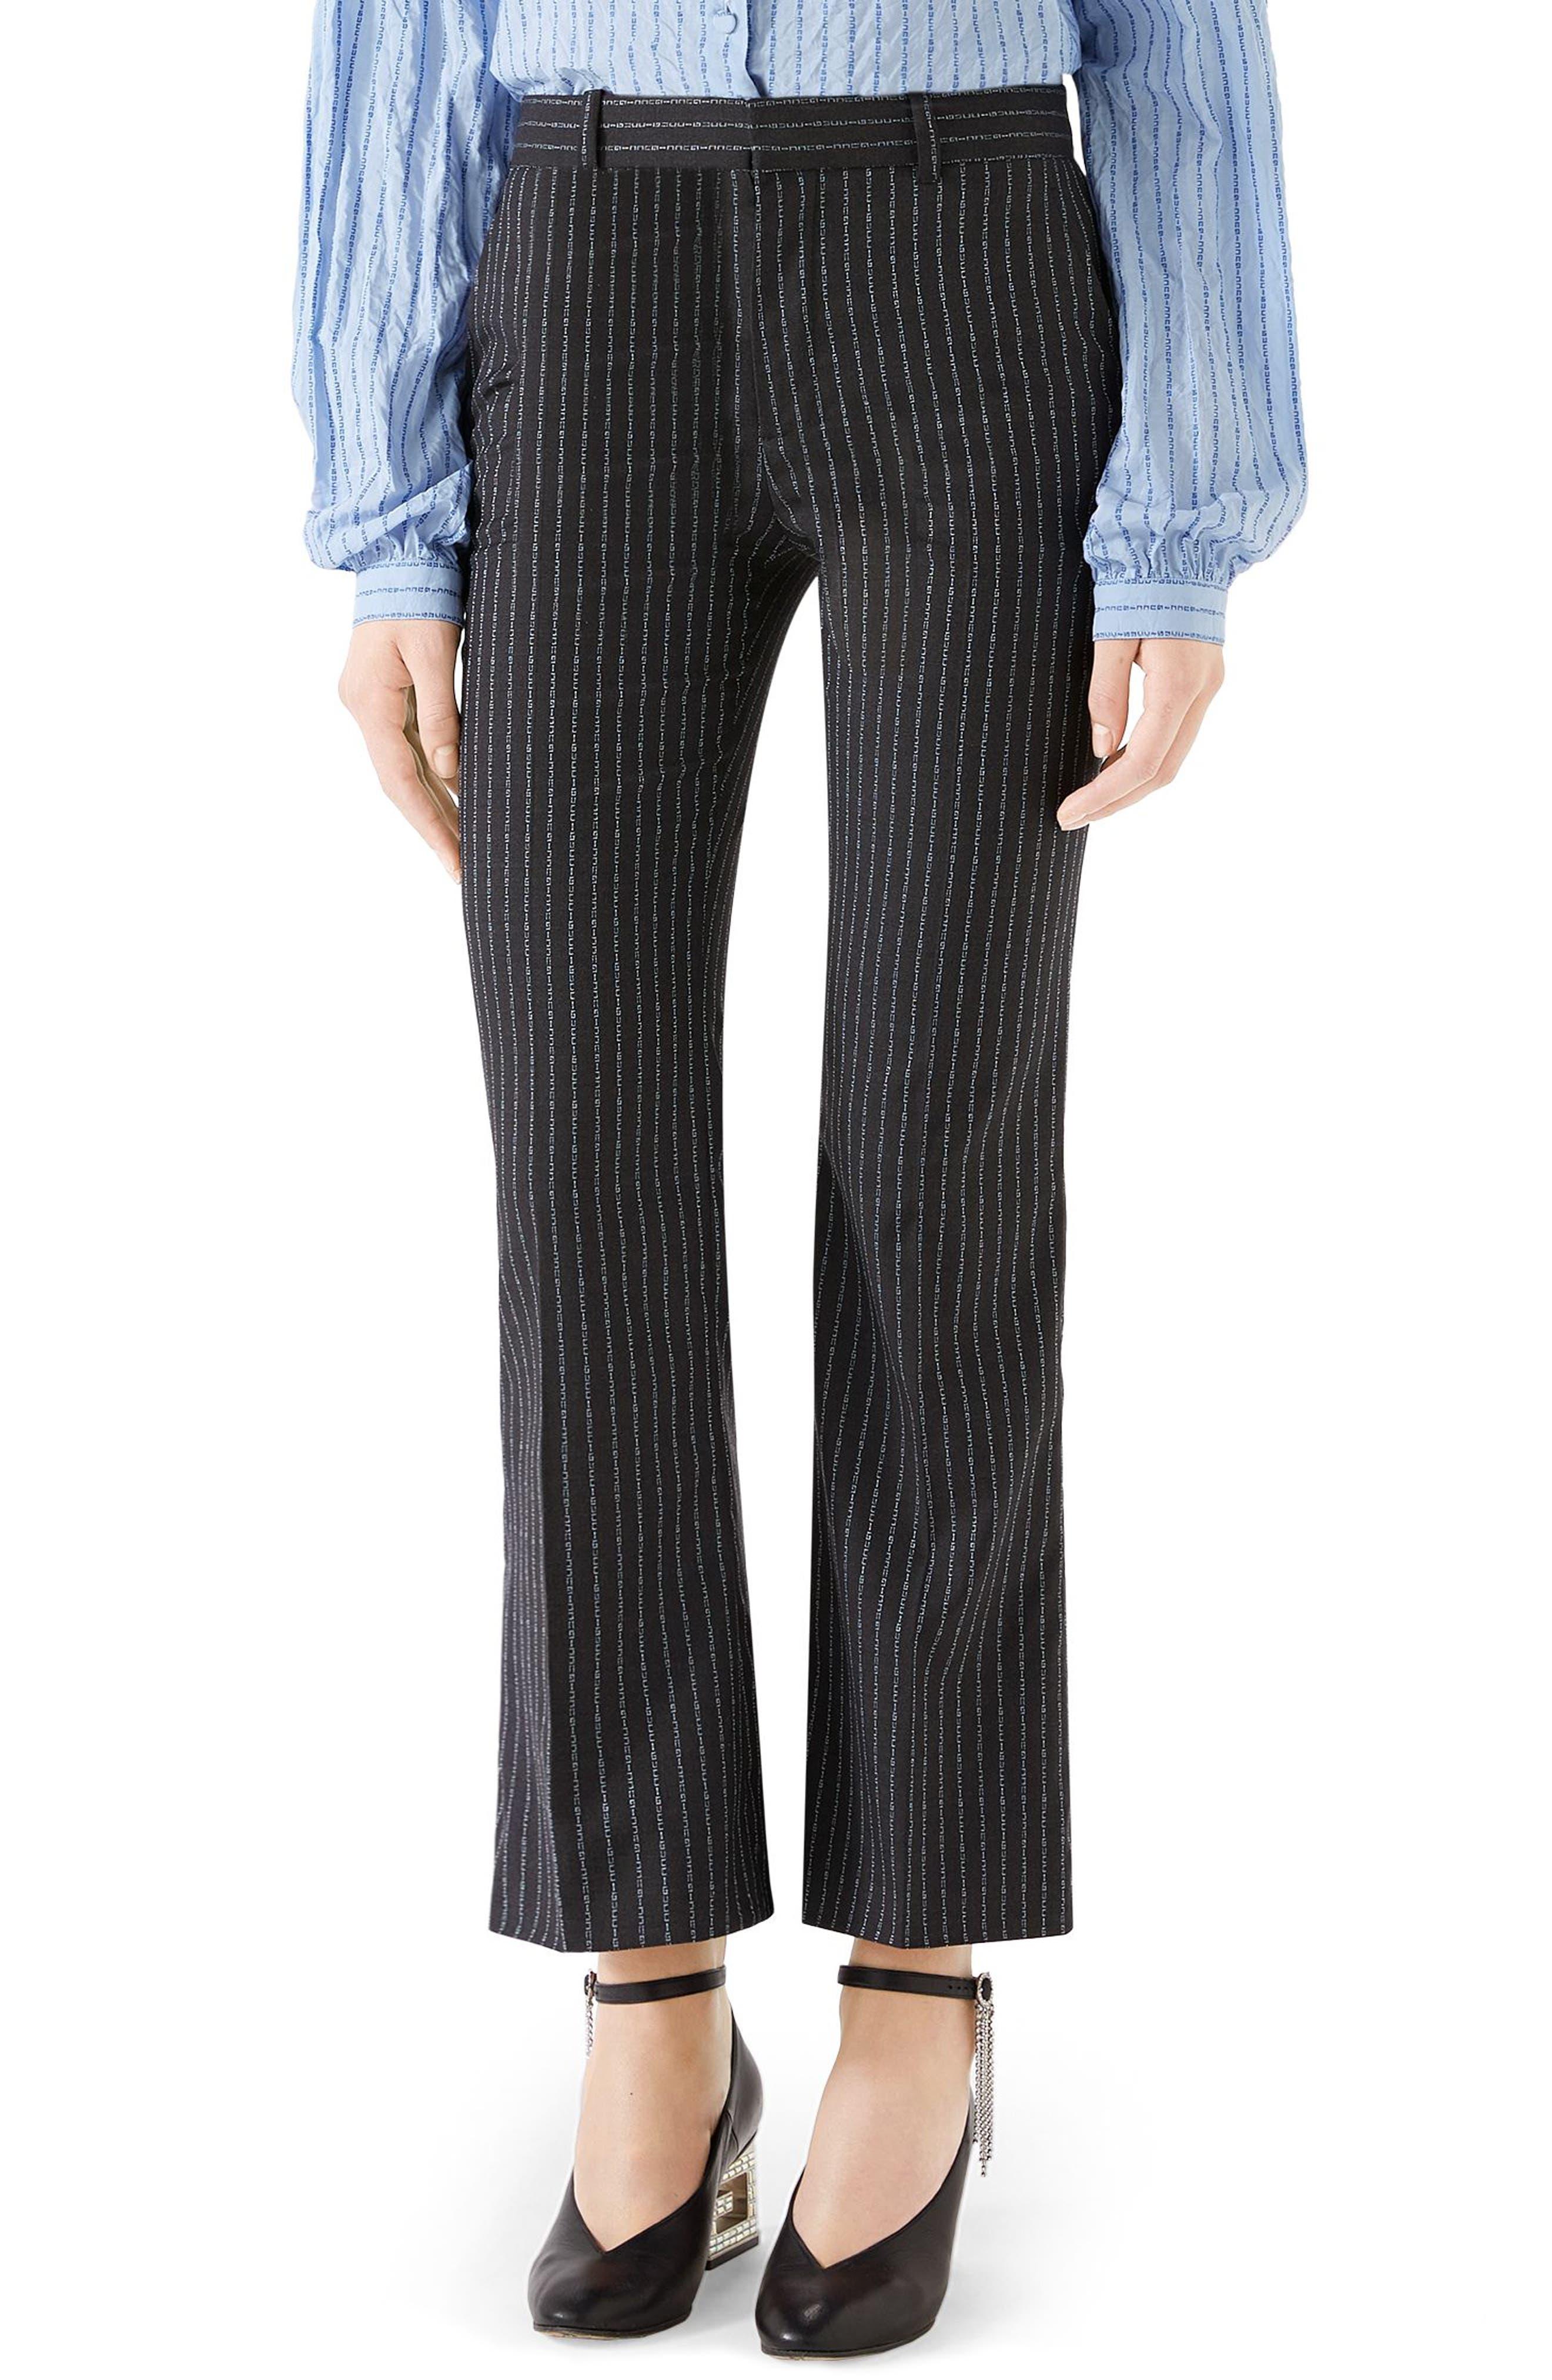 GUCCI Gucci Stripe Bootcut Pants, Main, color, 1180 DARK GREY/ AZURE